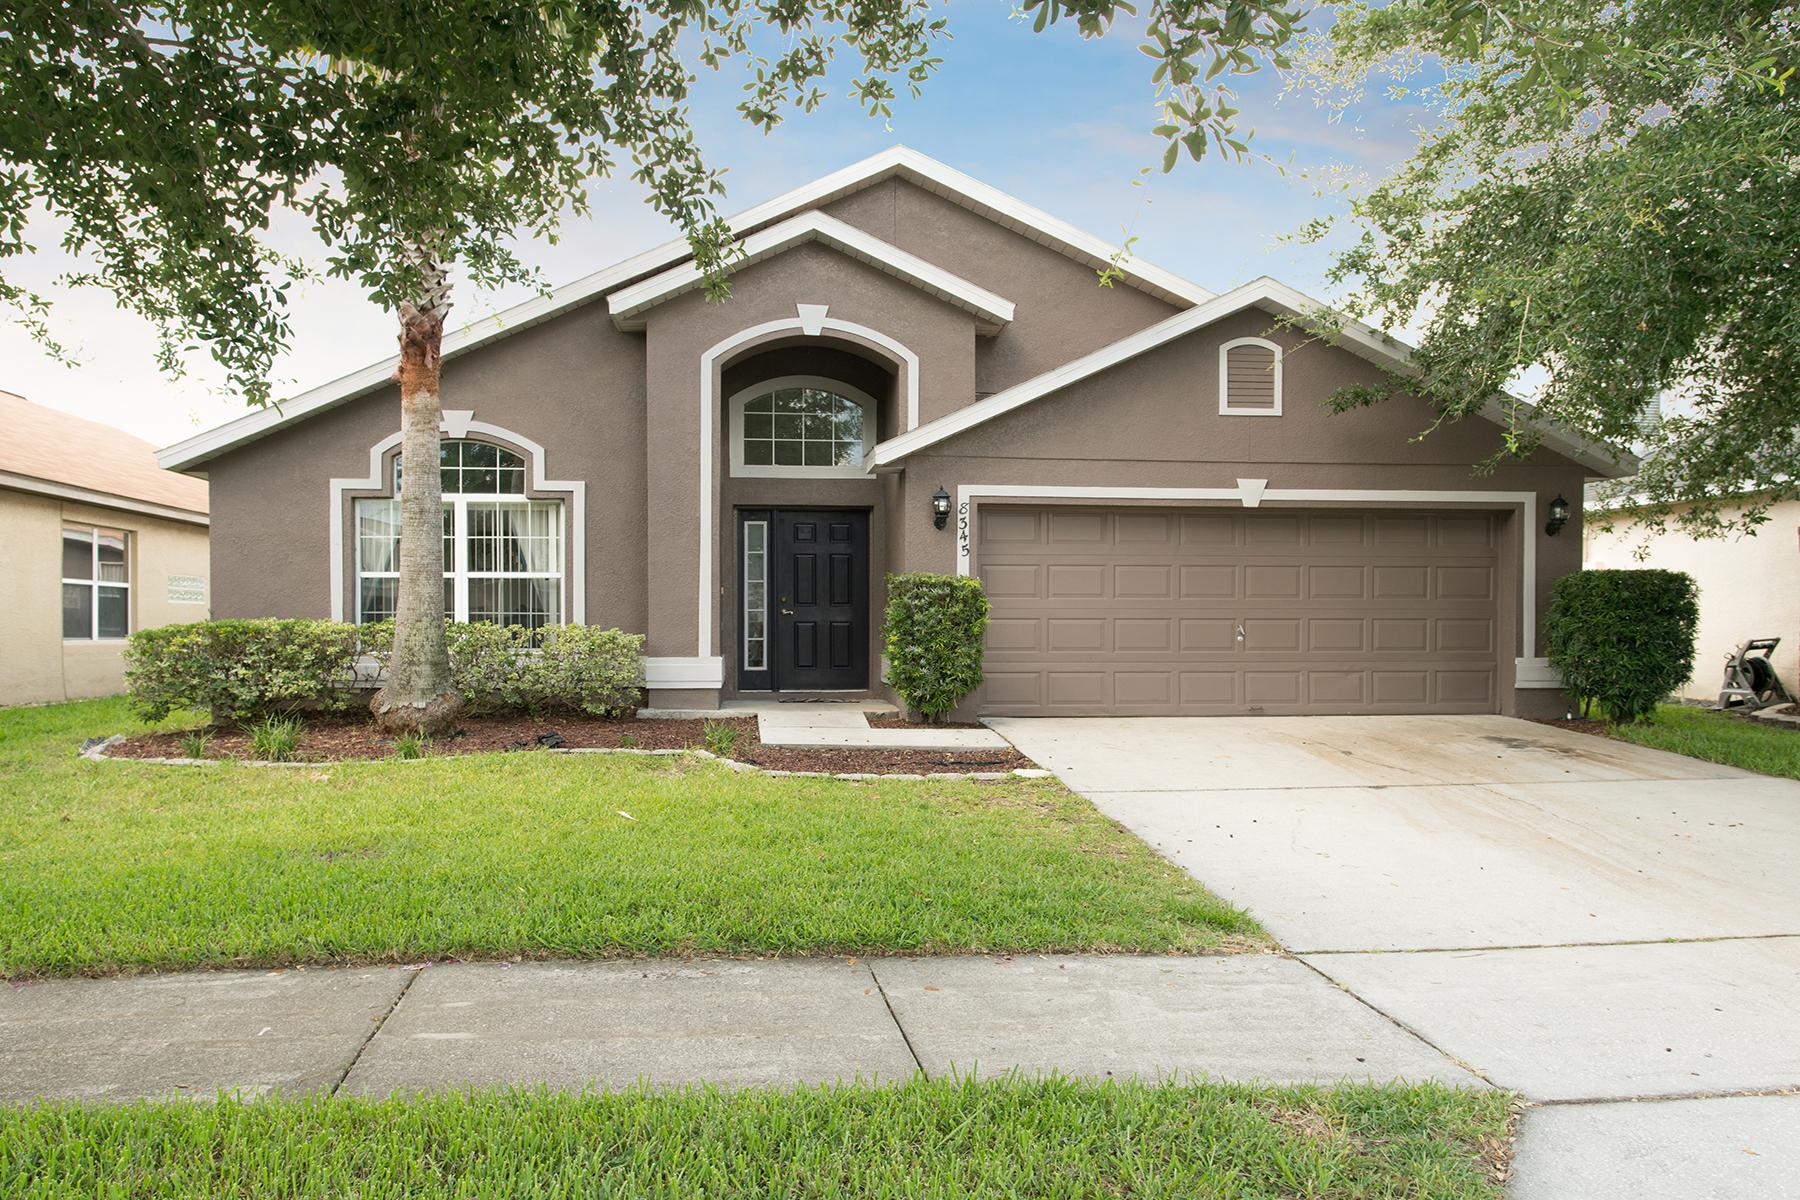 Single Family Home for Sale at ORLANDO 8345 Lake Amhurst Trl Orlando, Florida, 32829 United States